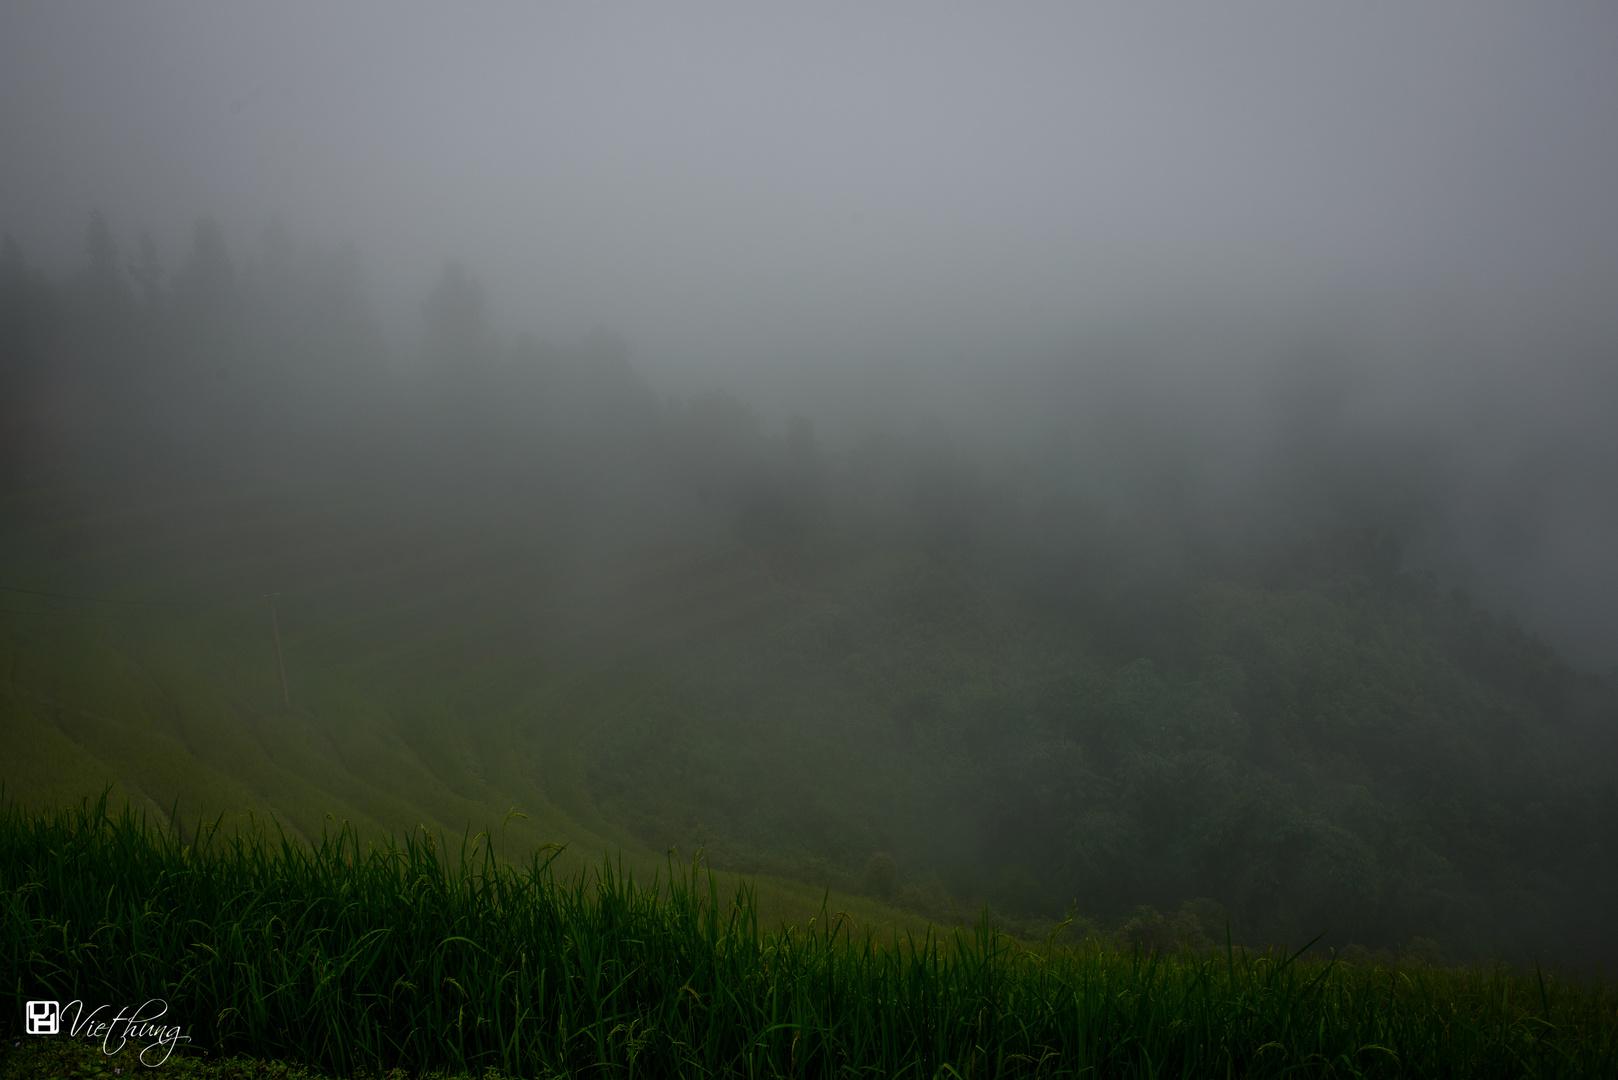 Foggy from Mu Cang Chai, Yen Bai